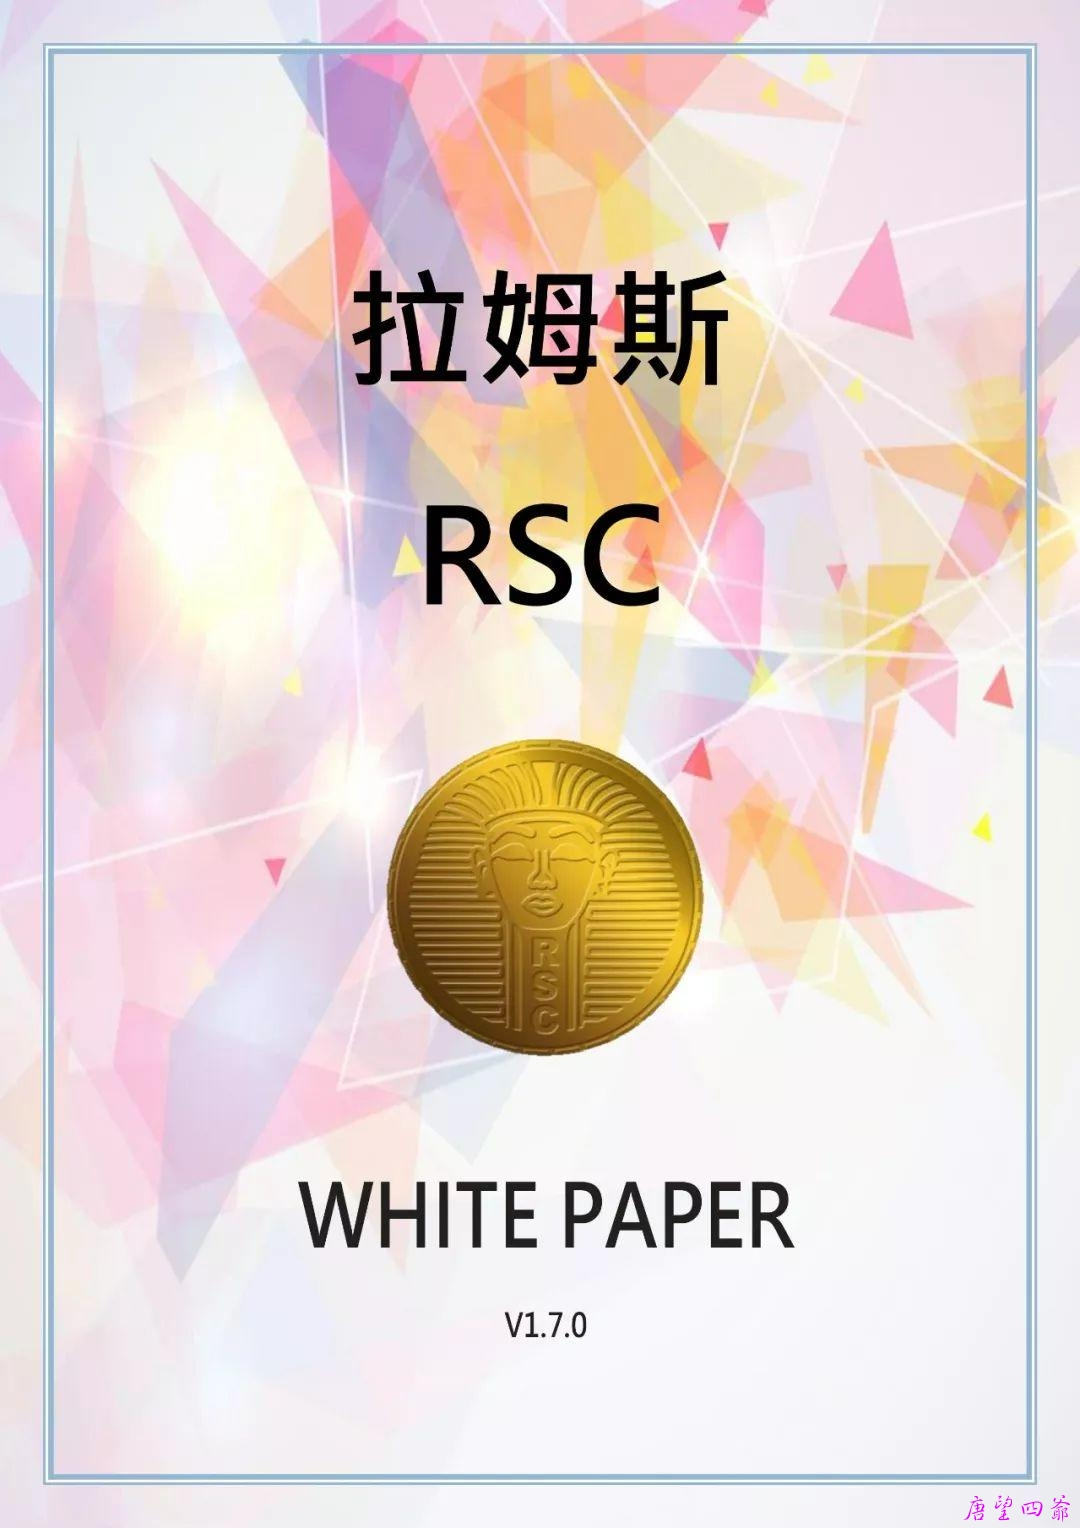 RSC Whitepaper拉姆斯币 (白皮书)